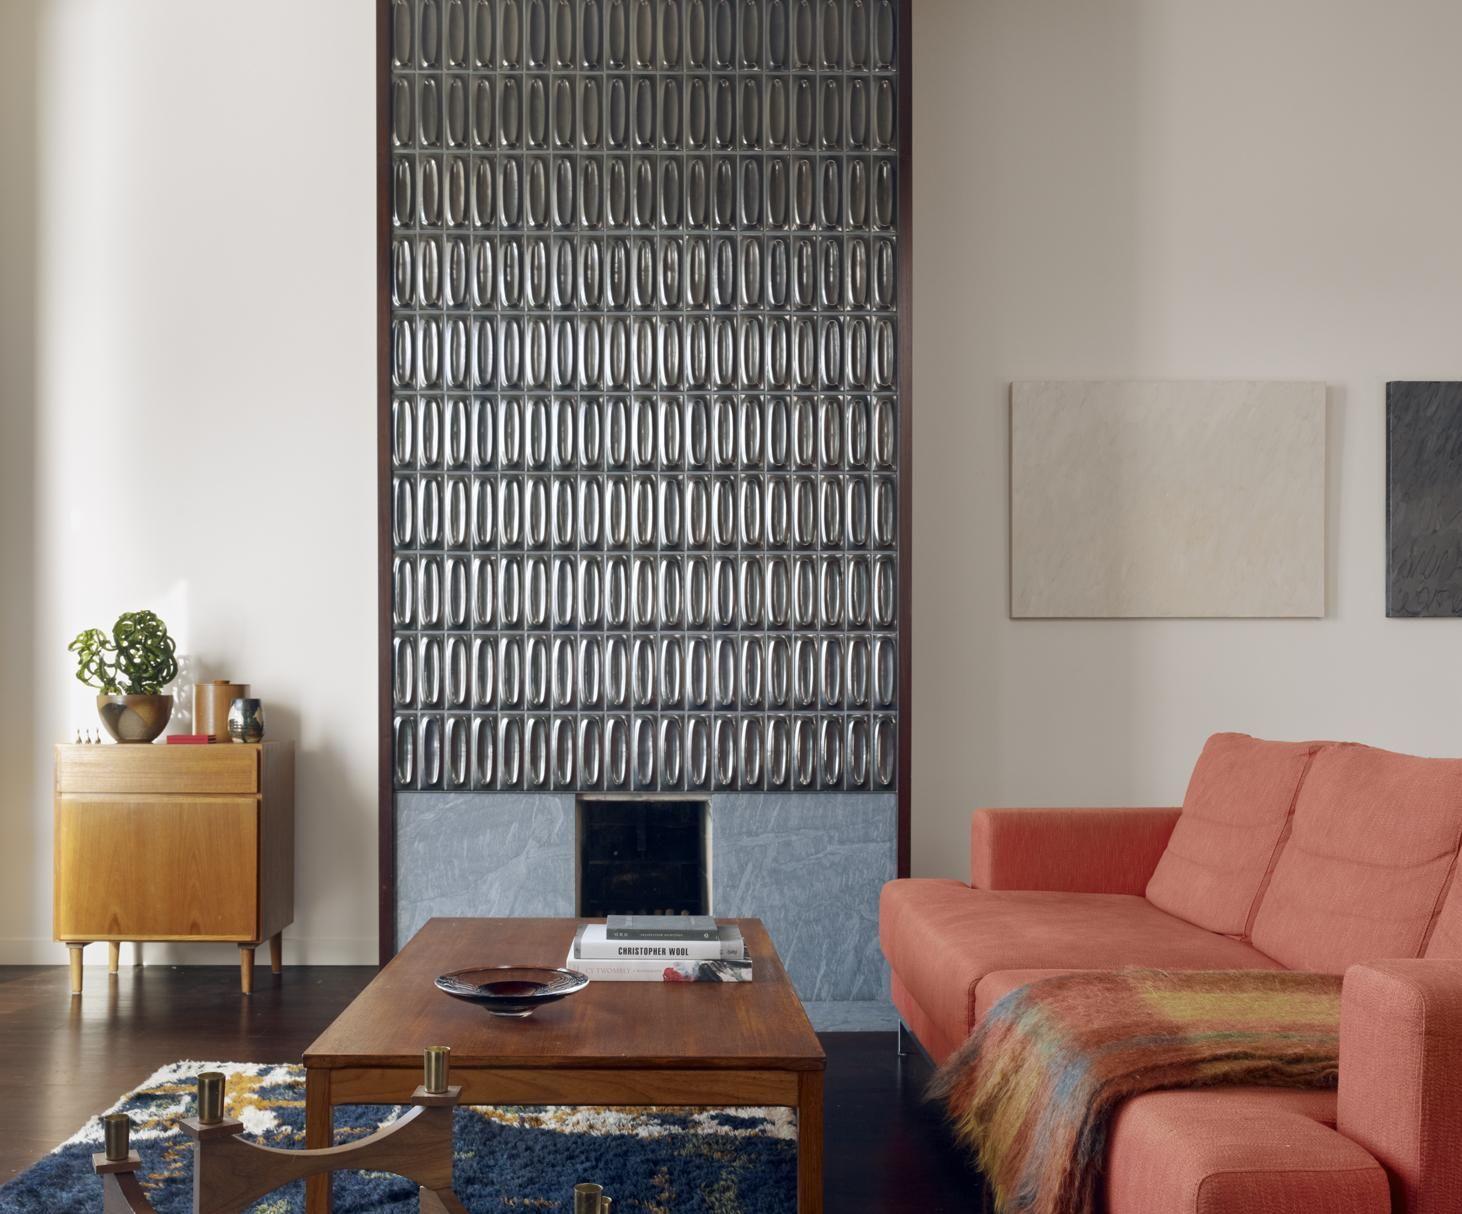 Installation Inspiration Heath Ceramics Contemporary Living Room Modern Style Furniture Interior Design